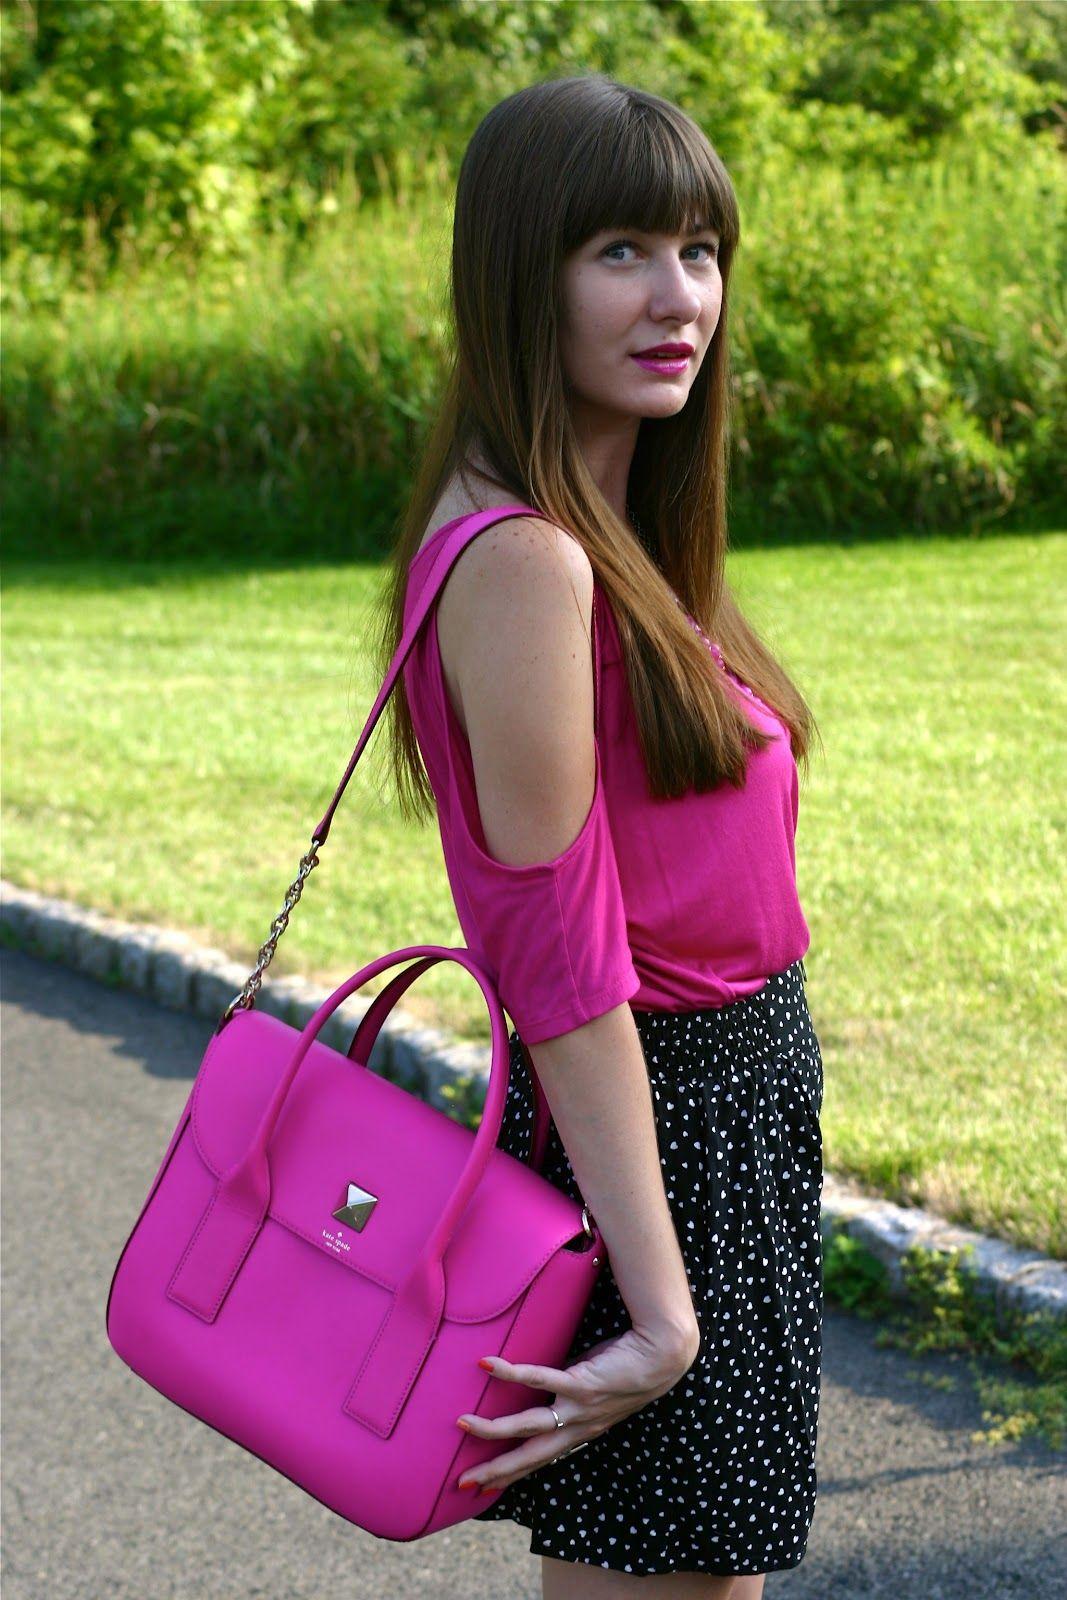 @kate spade new york New Bond Street Florence bag. Love! #handbags #bags #neon #pink #style #fashionbloggers